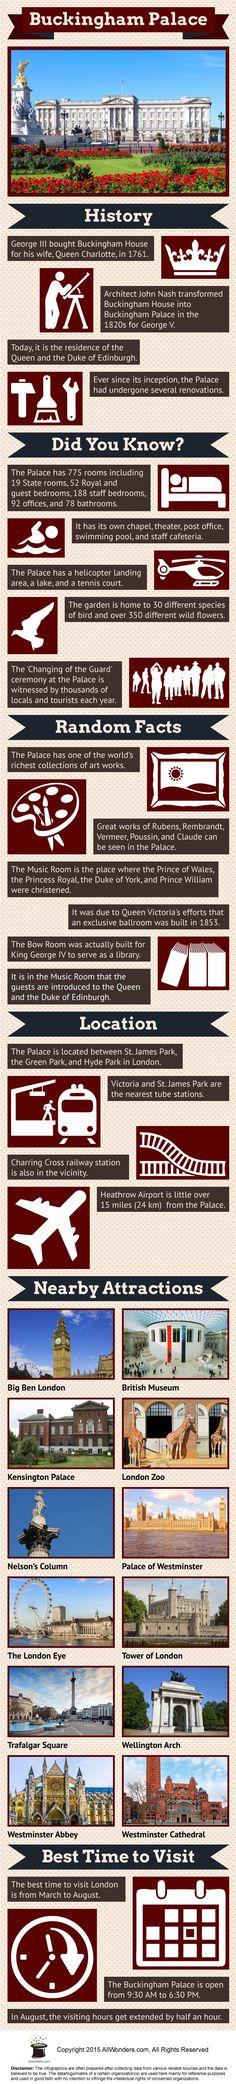 Buckingham Palace Infographic                                                                                                                                                                                 More